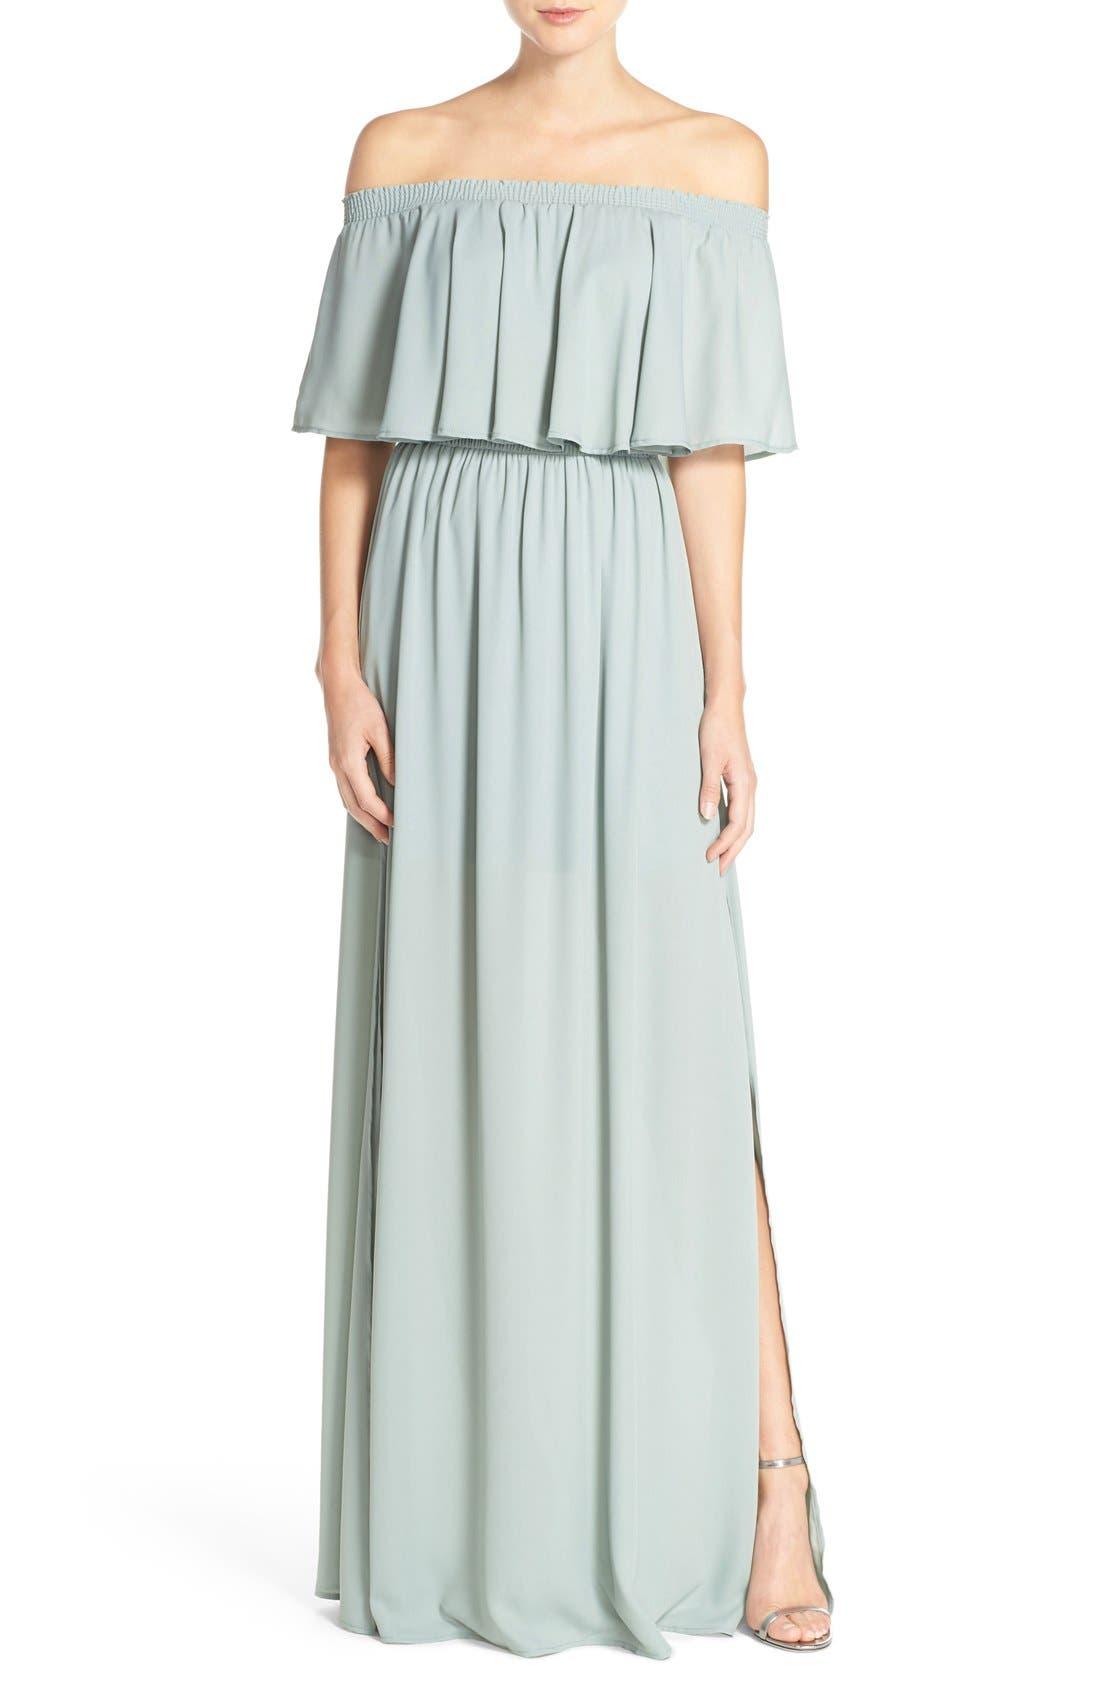 Show Me Your Mumu Hacienda Convertible Gown